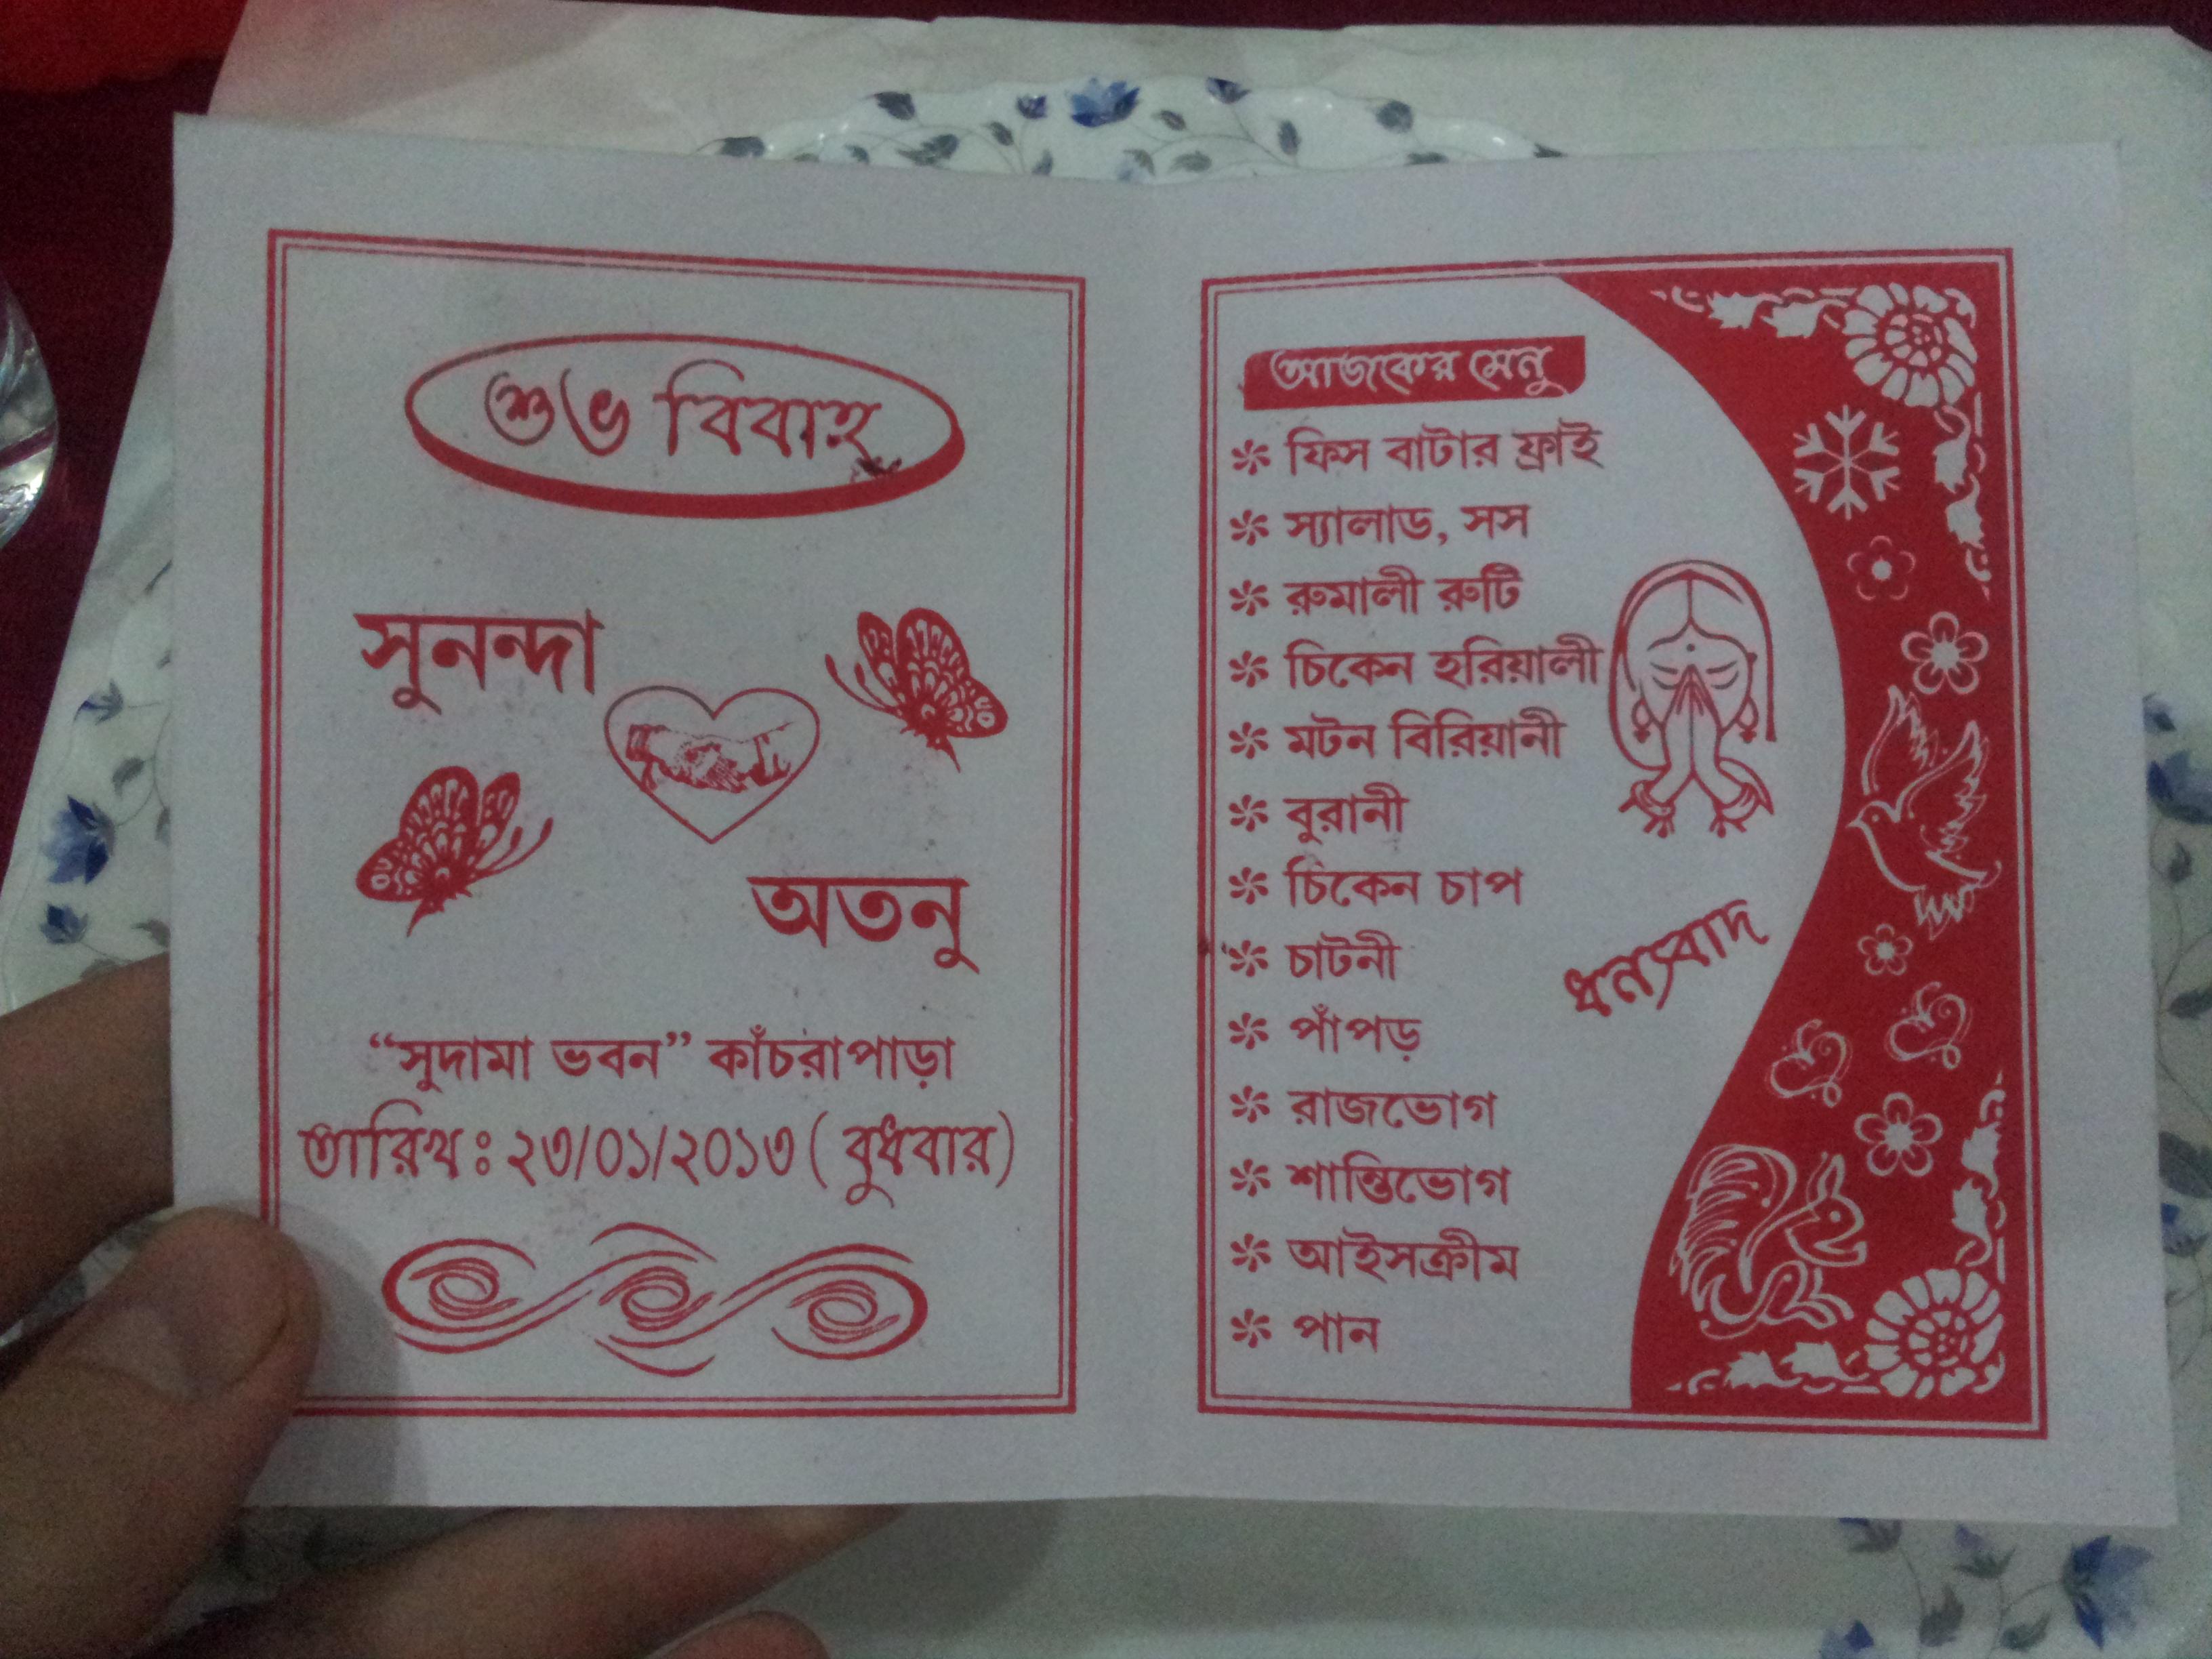 Bengali Food Menu In Marriage Ceremony